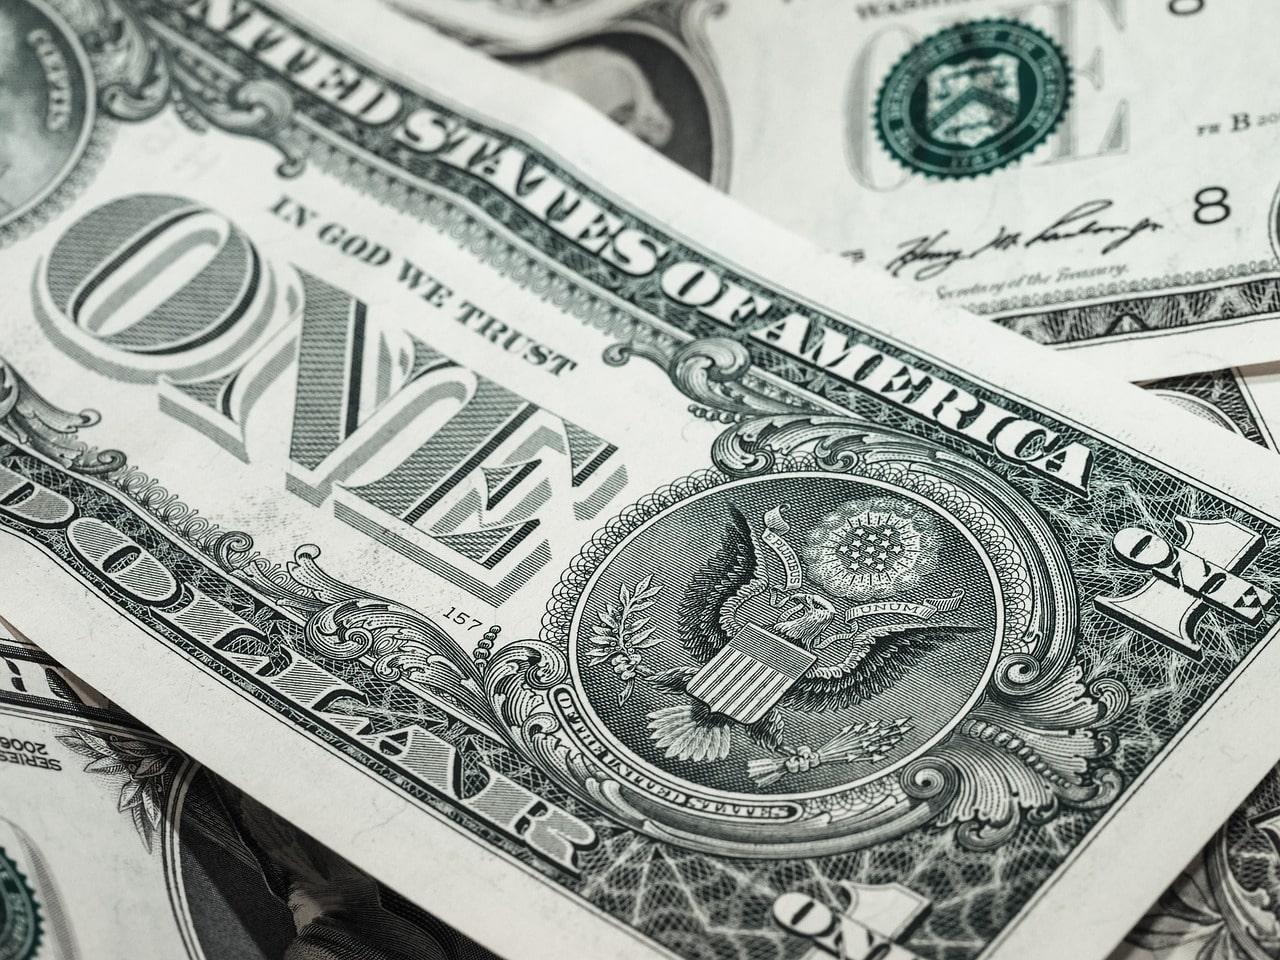 Safeguard Business Counterfait Money Header Image